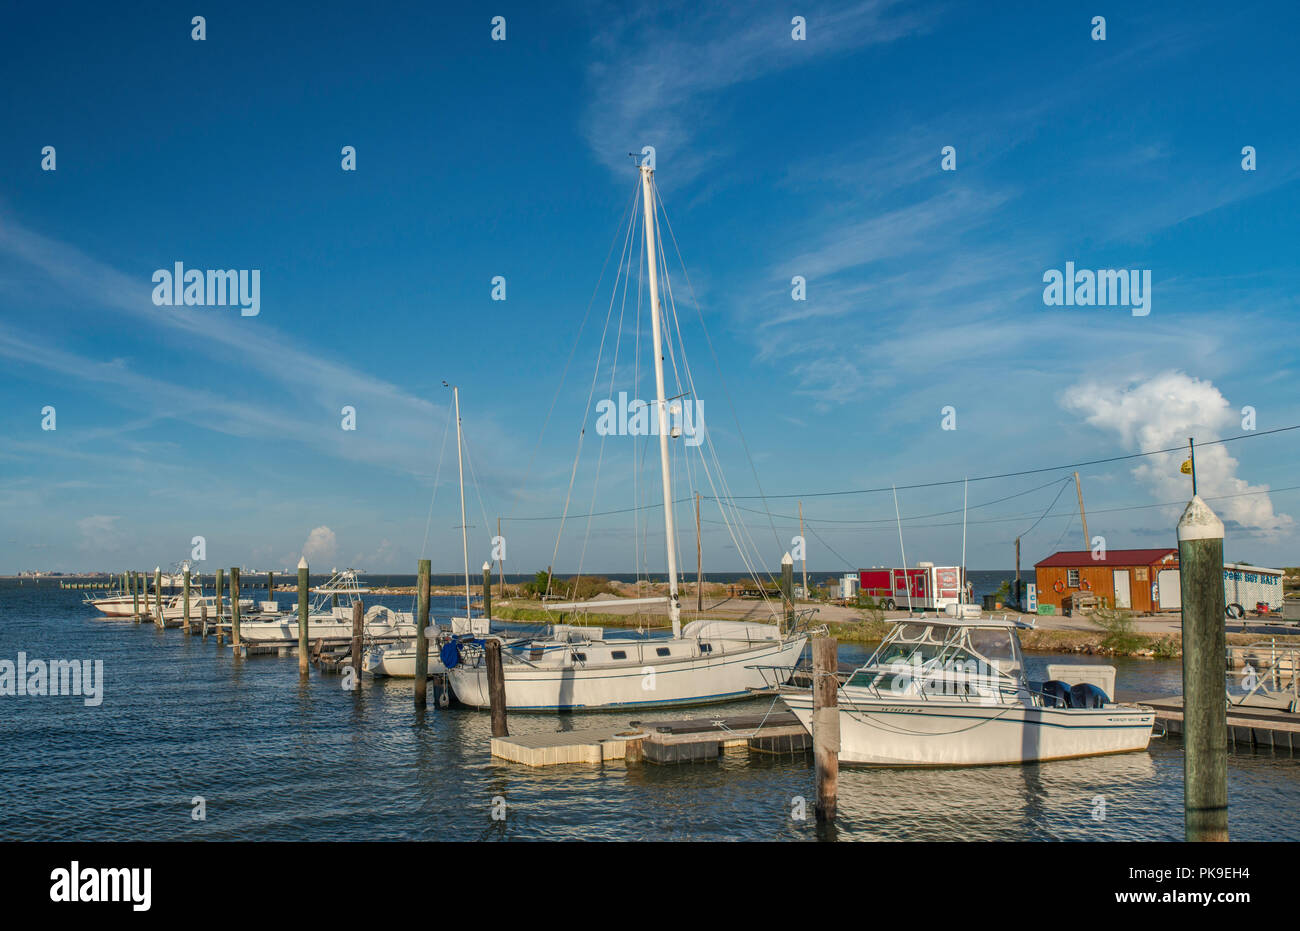 Sailboats at Nautical Landings Marina in Port Lavaca, Gulf Coast, Texas, USA - Stock Image